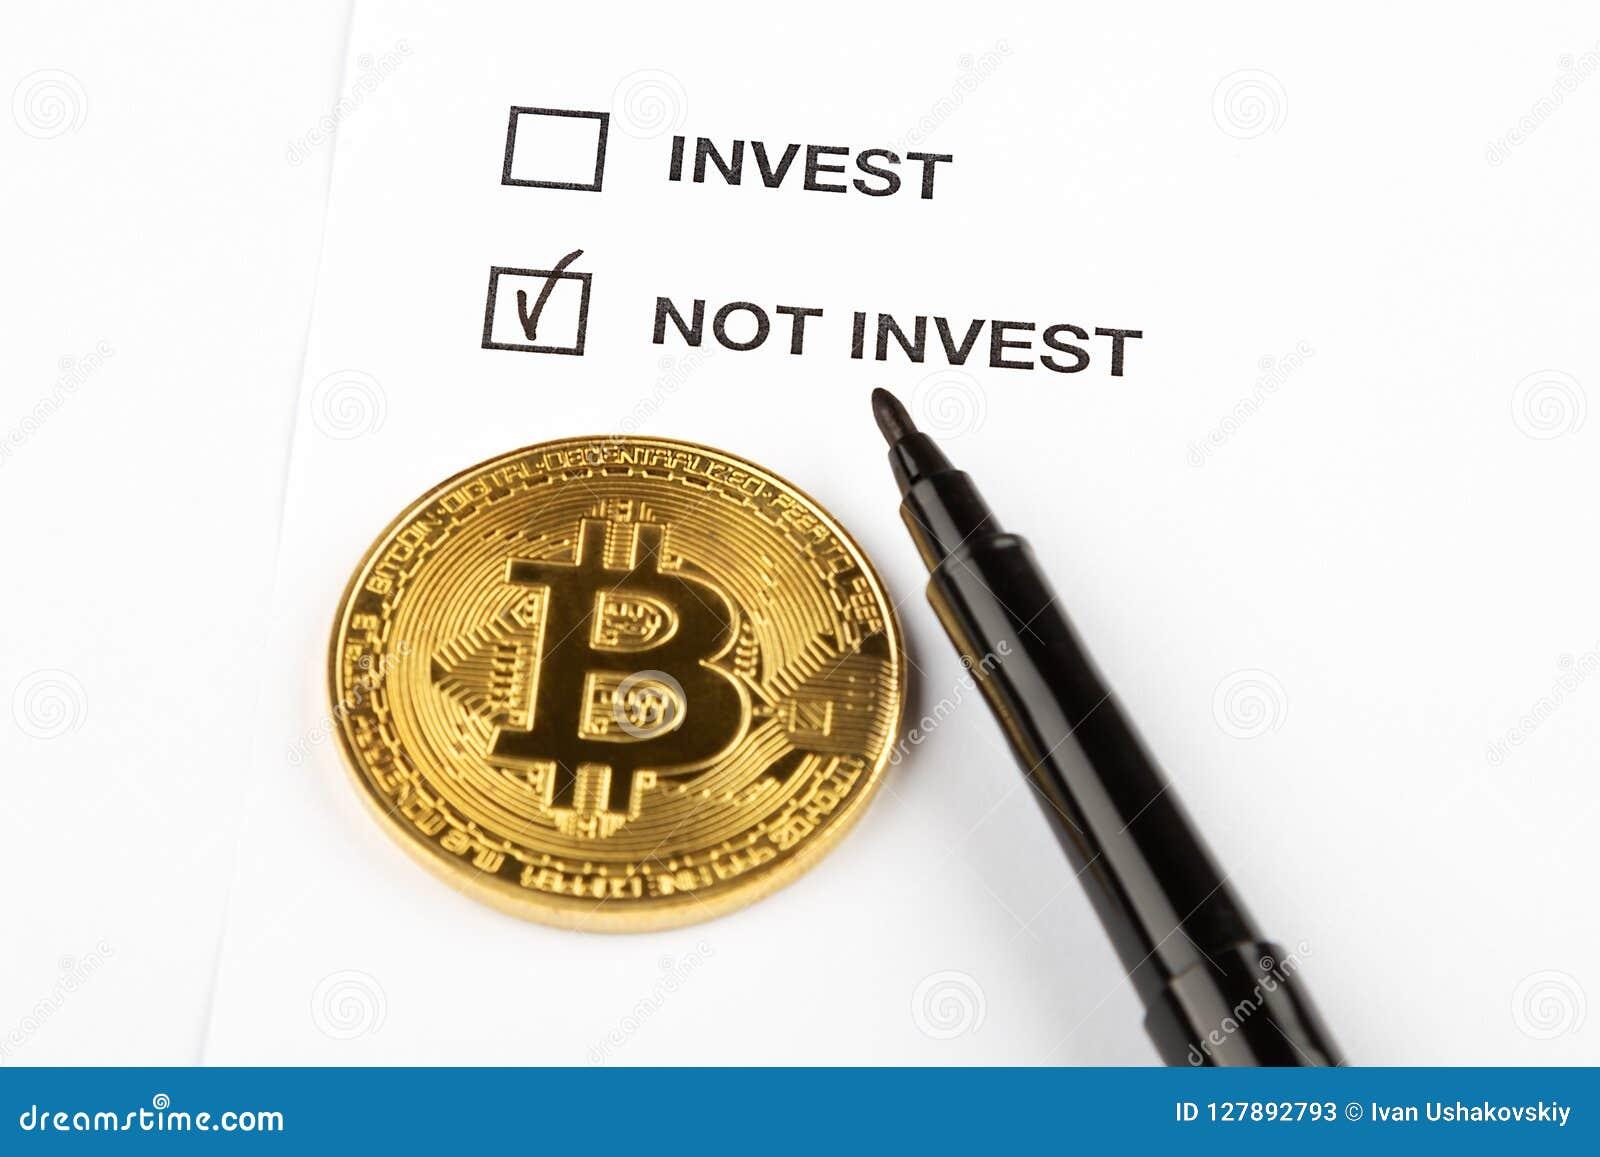 invest money on bitcoin